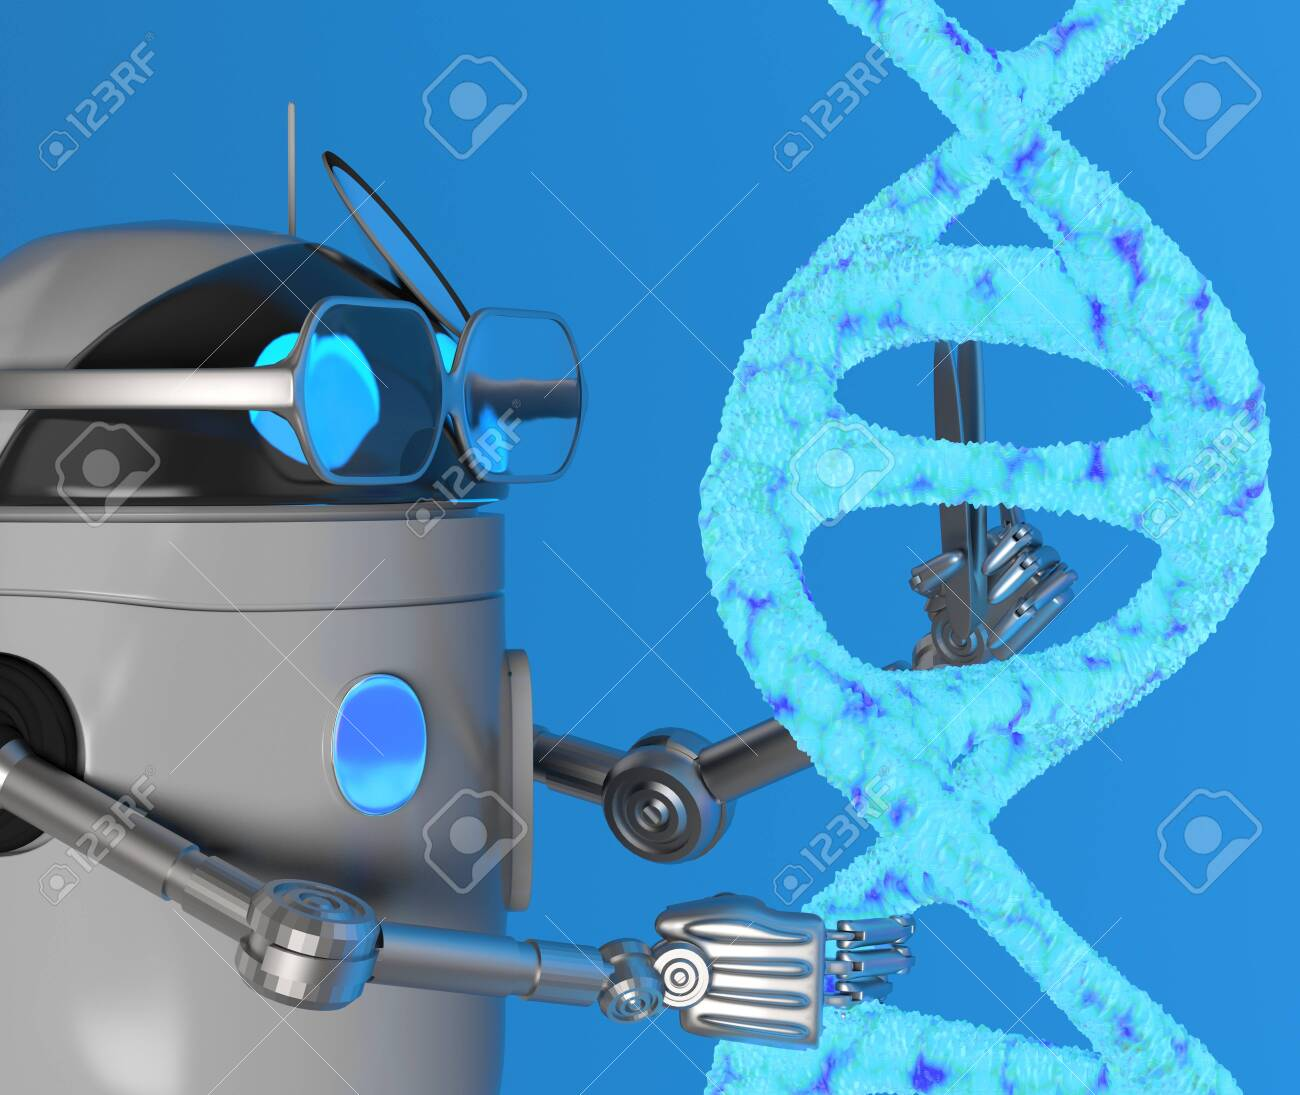 The robot fix Blue Dna molecule,text,3d render. - 131122248